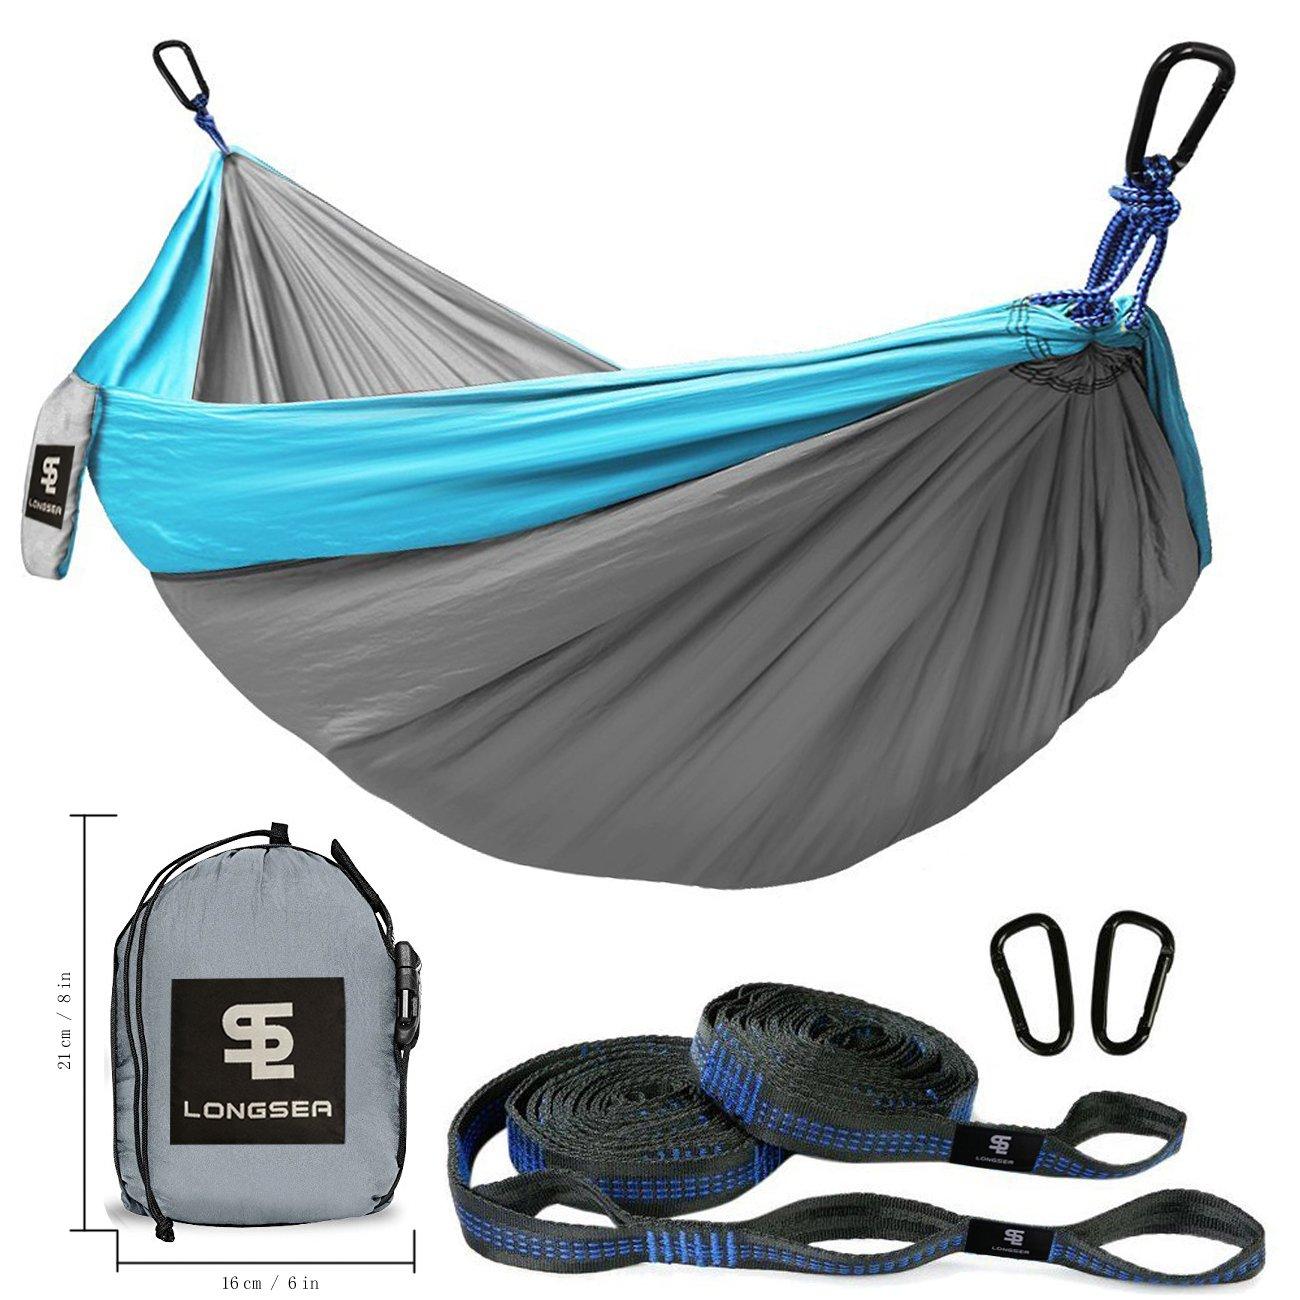 Longsea Double Camping Hammocks Garden Hammock Ultralight Portable Nylon Parachute Multifunctional Lightweight Hammocks 2 x Adjustable Hanging Straps Travel, Beach, Yard, Hiking (Blue+Grey)